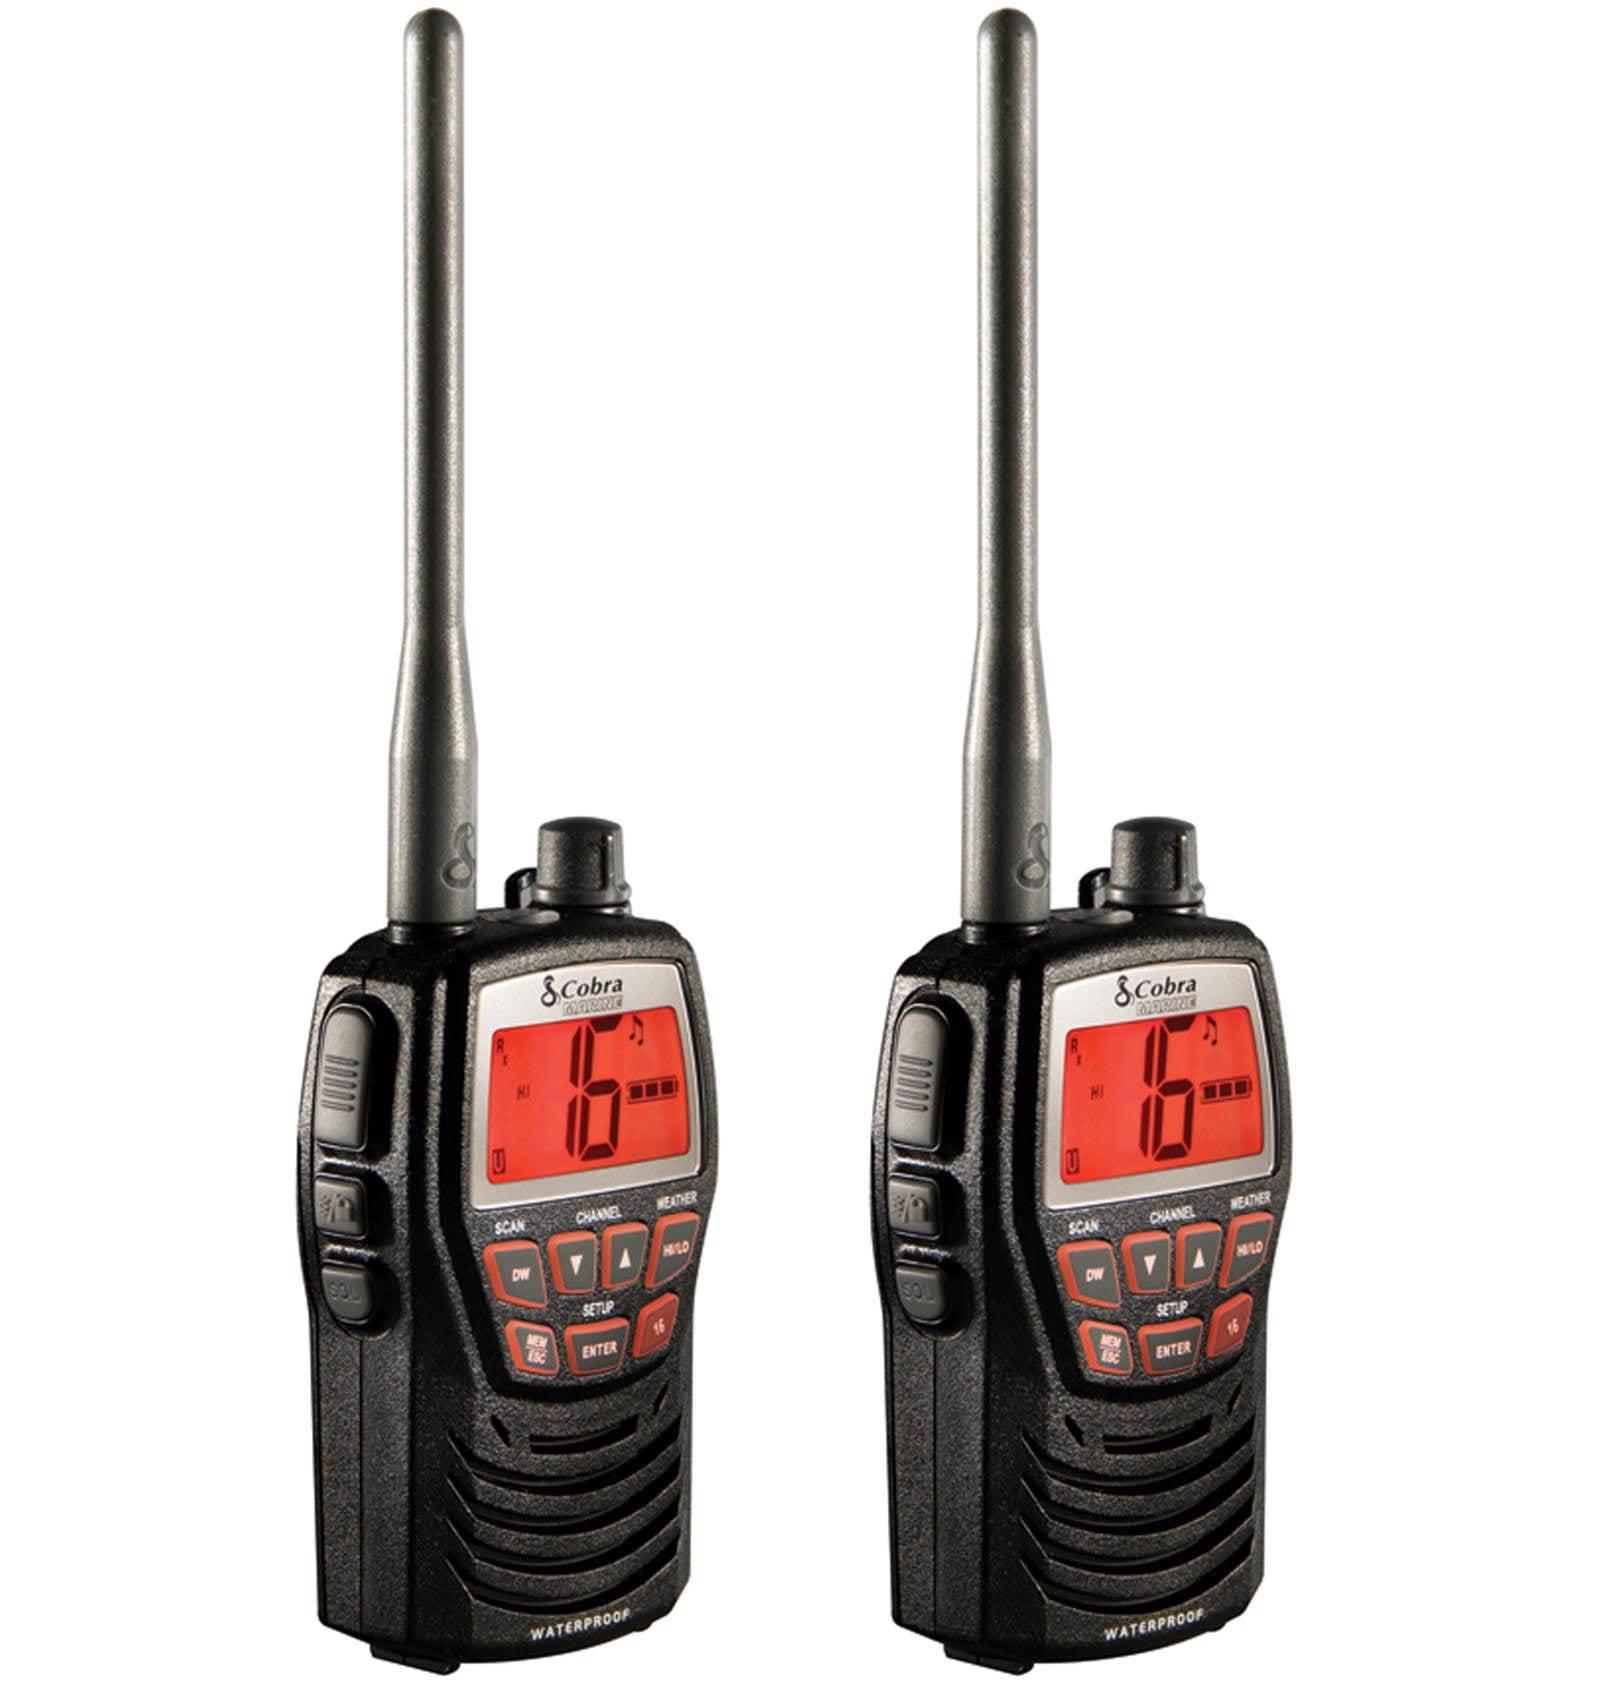 2 Cobra 3w Rechargeable 2 Way Vhf Walkie Talkie Marine Boat Radios Mr Hh125 Walmart Com Walmart Com